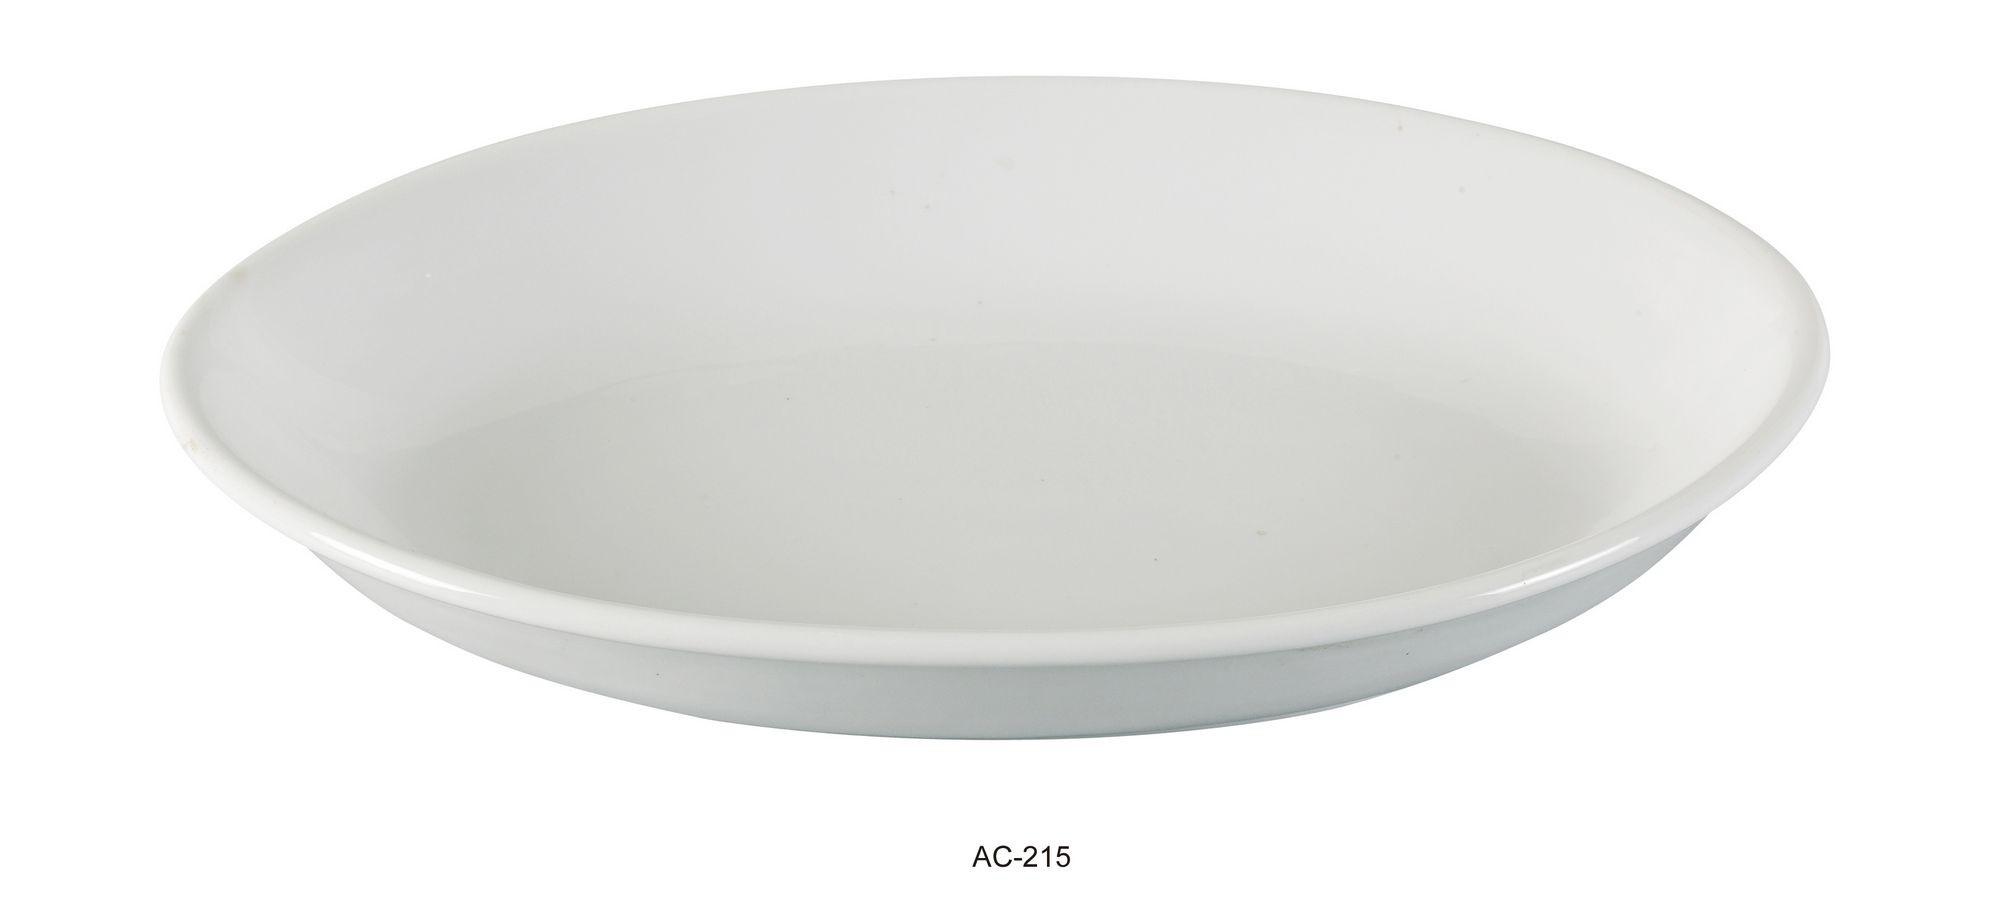 "Yanco AC-215 Abco 15 1/2"" x 11"" x 2"" Oval Deep Platter"